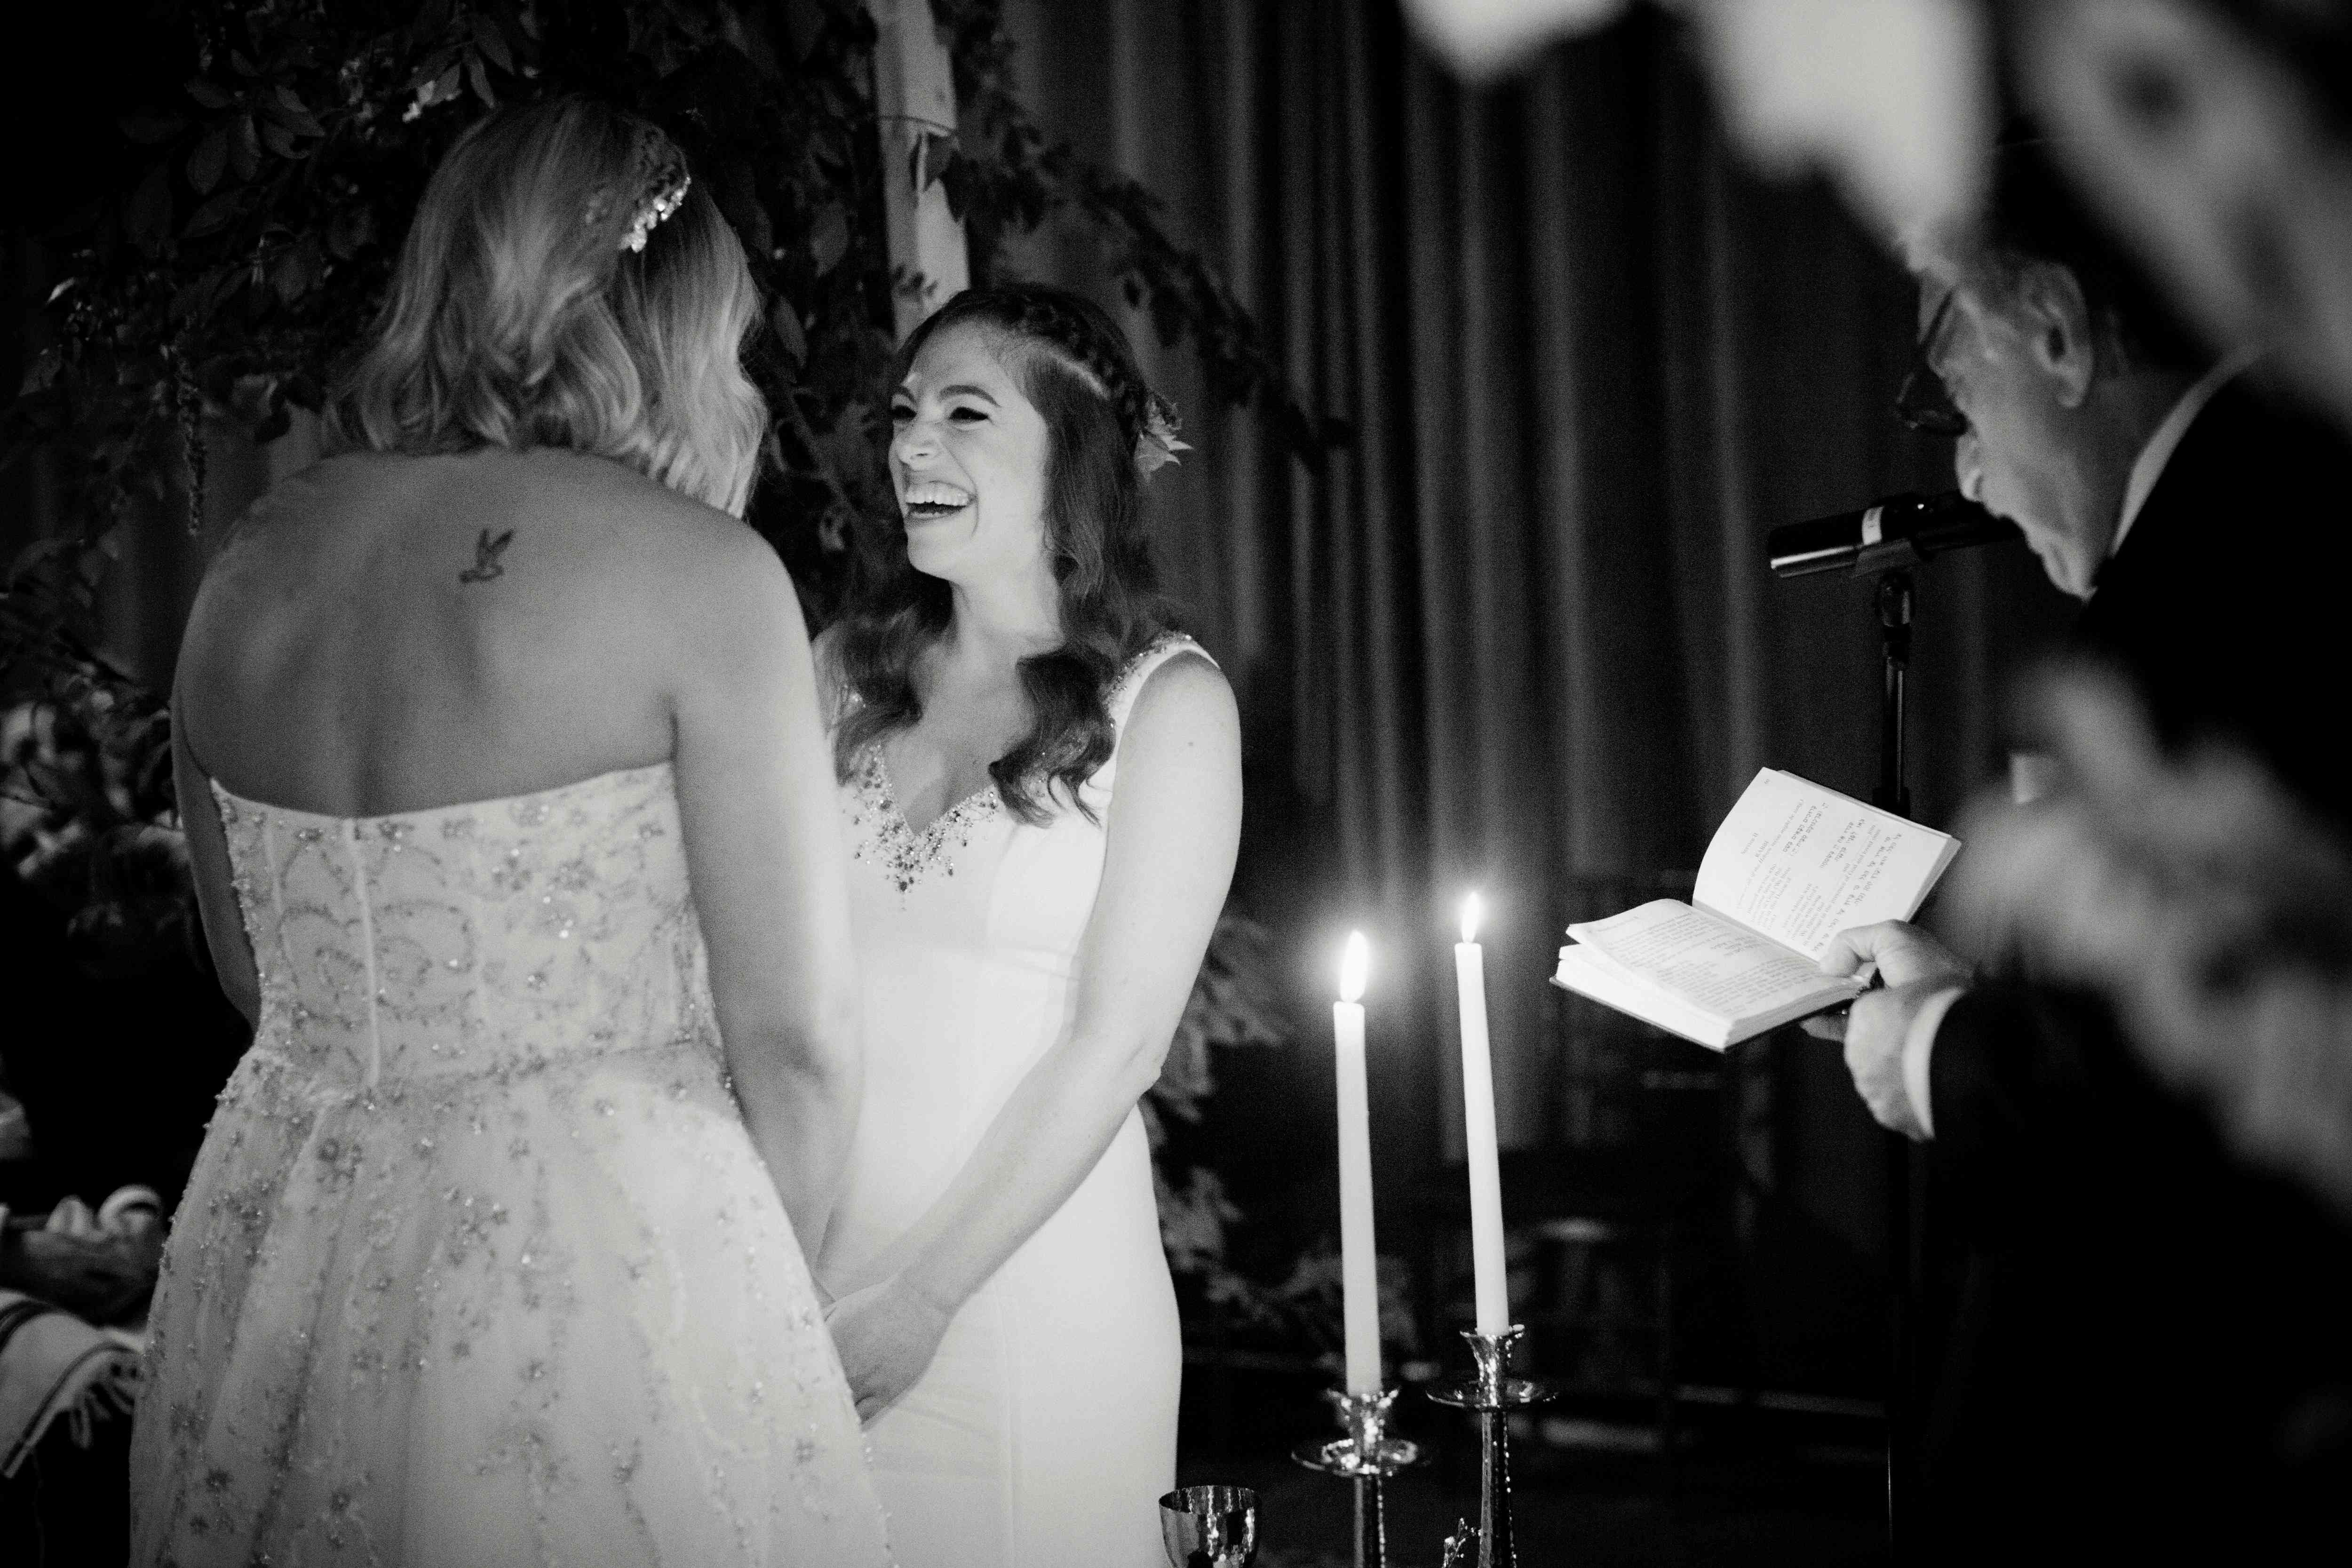 lesbian wedding brides at altar